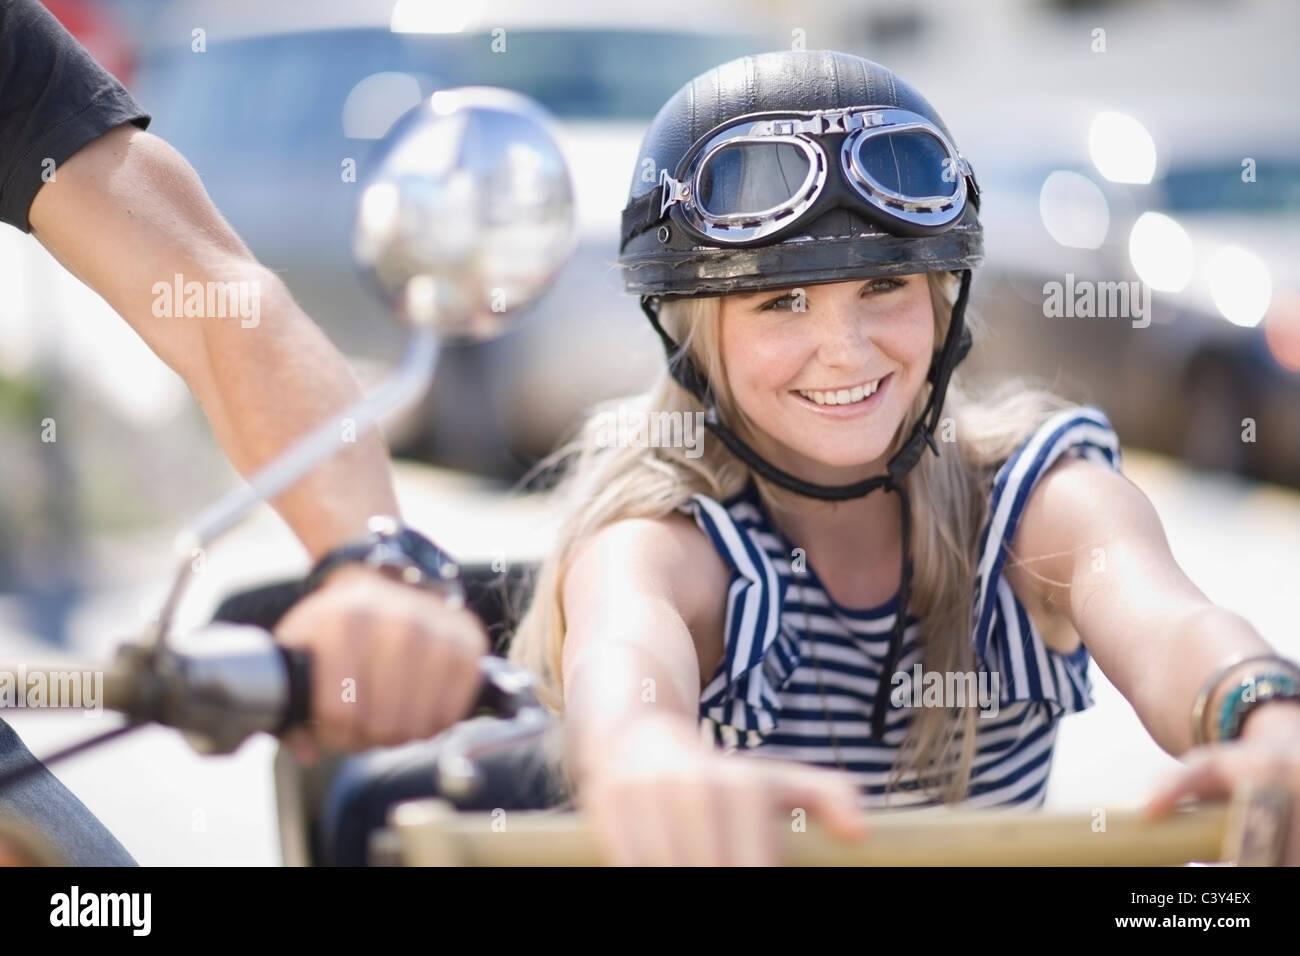 Woman on a motorbike - Stock Image